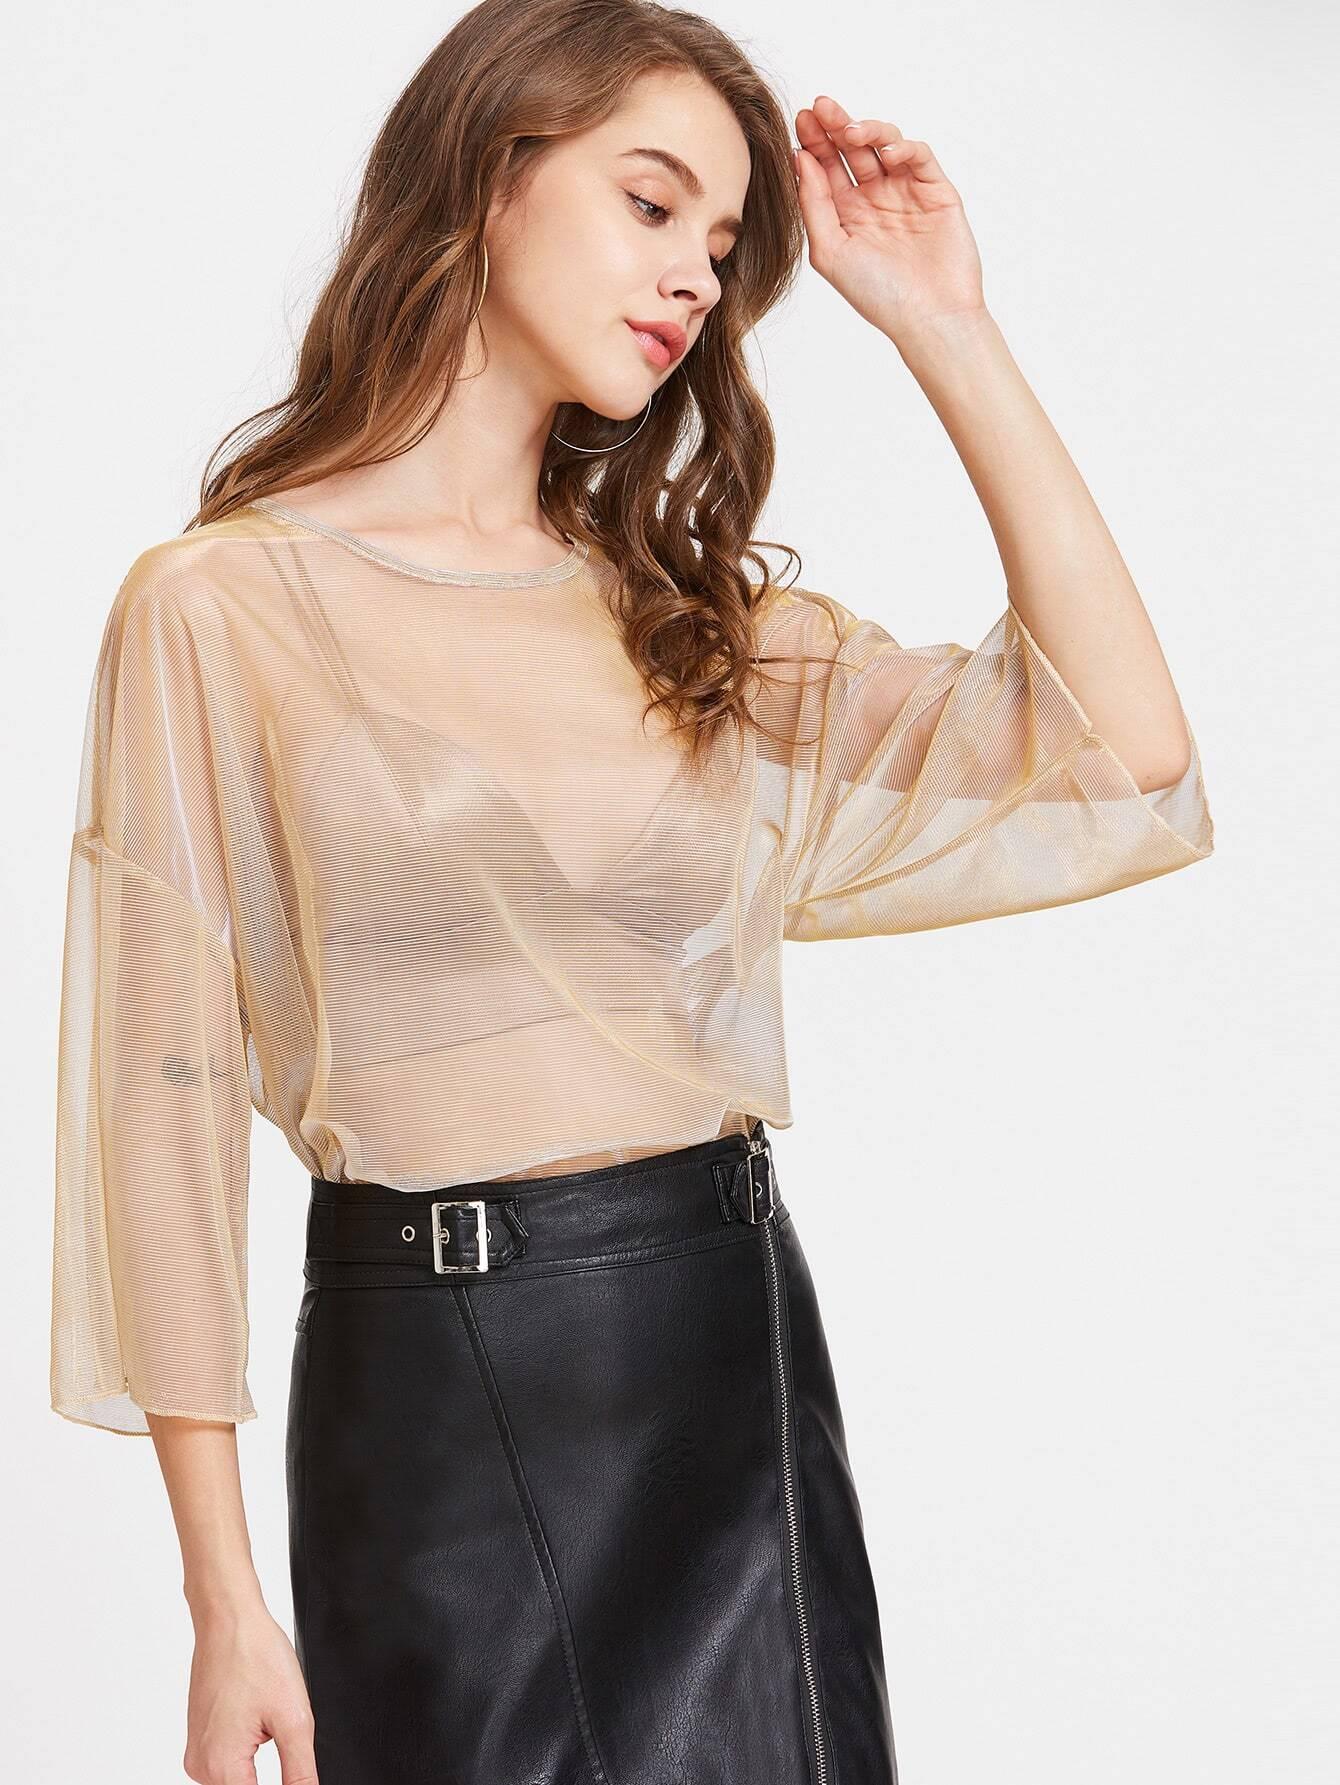 blouse170328705_2